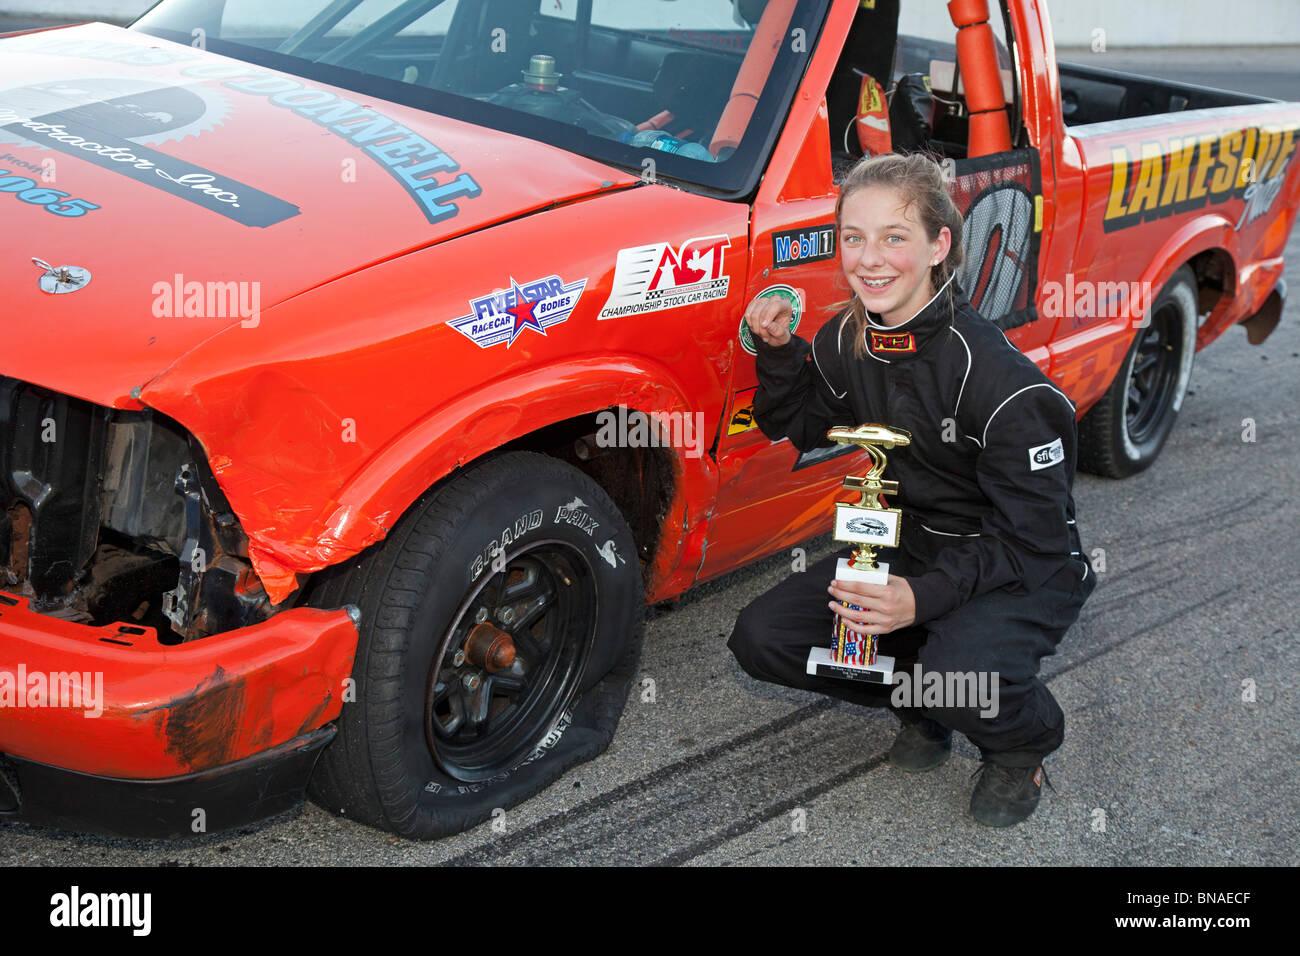 Thirteen-year-old Stock Car Race Winner Stock Photo: 30348991 - Alamy